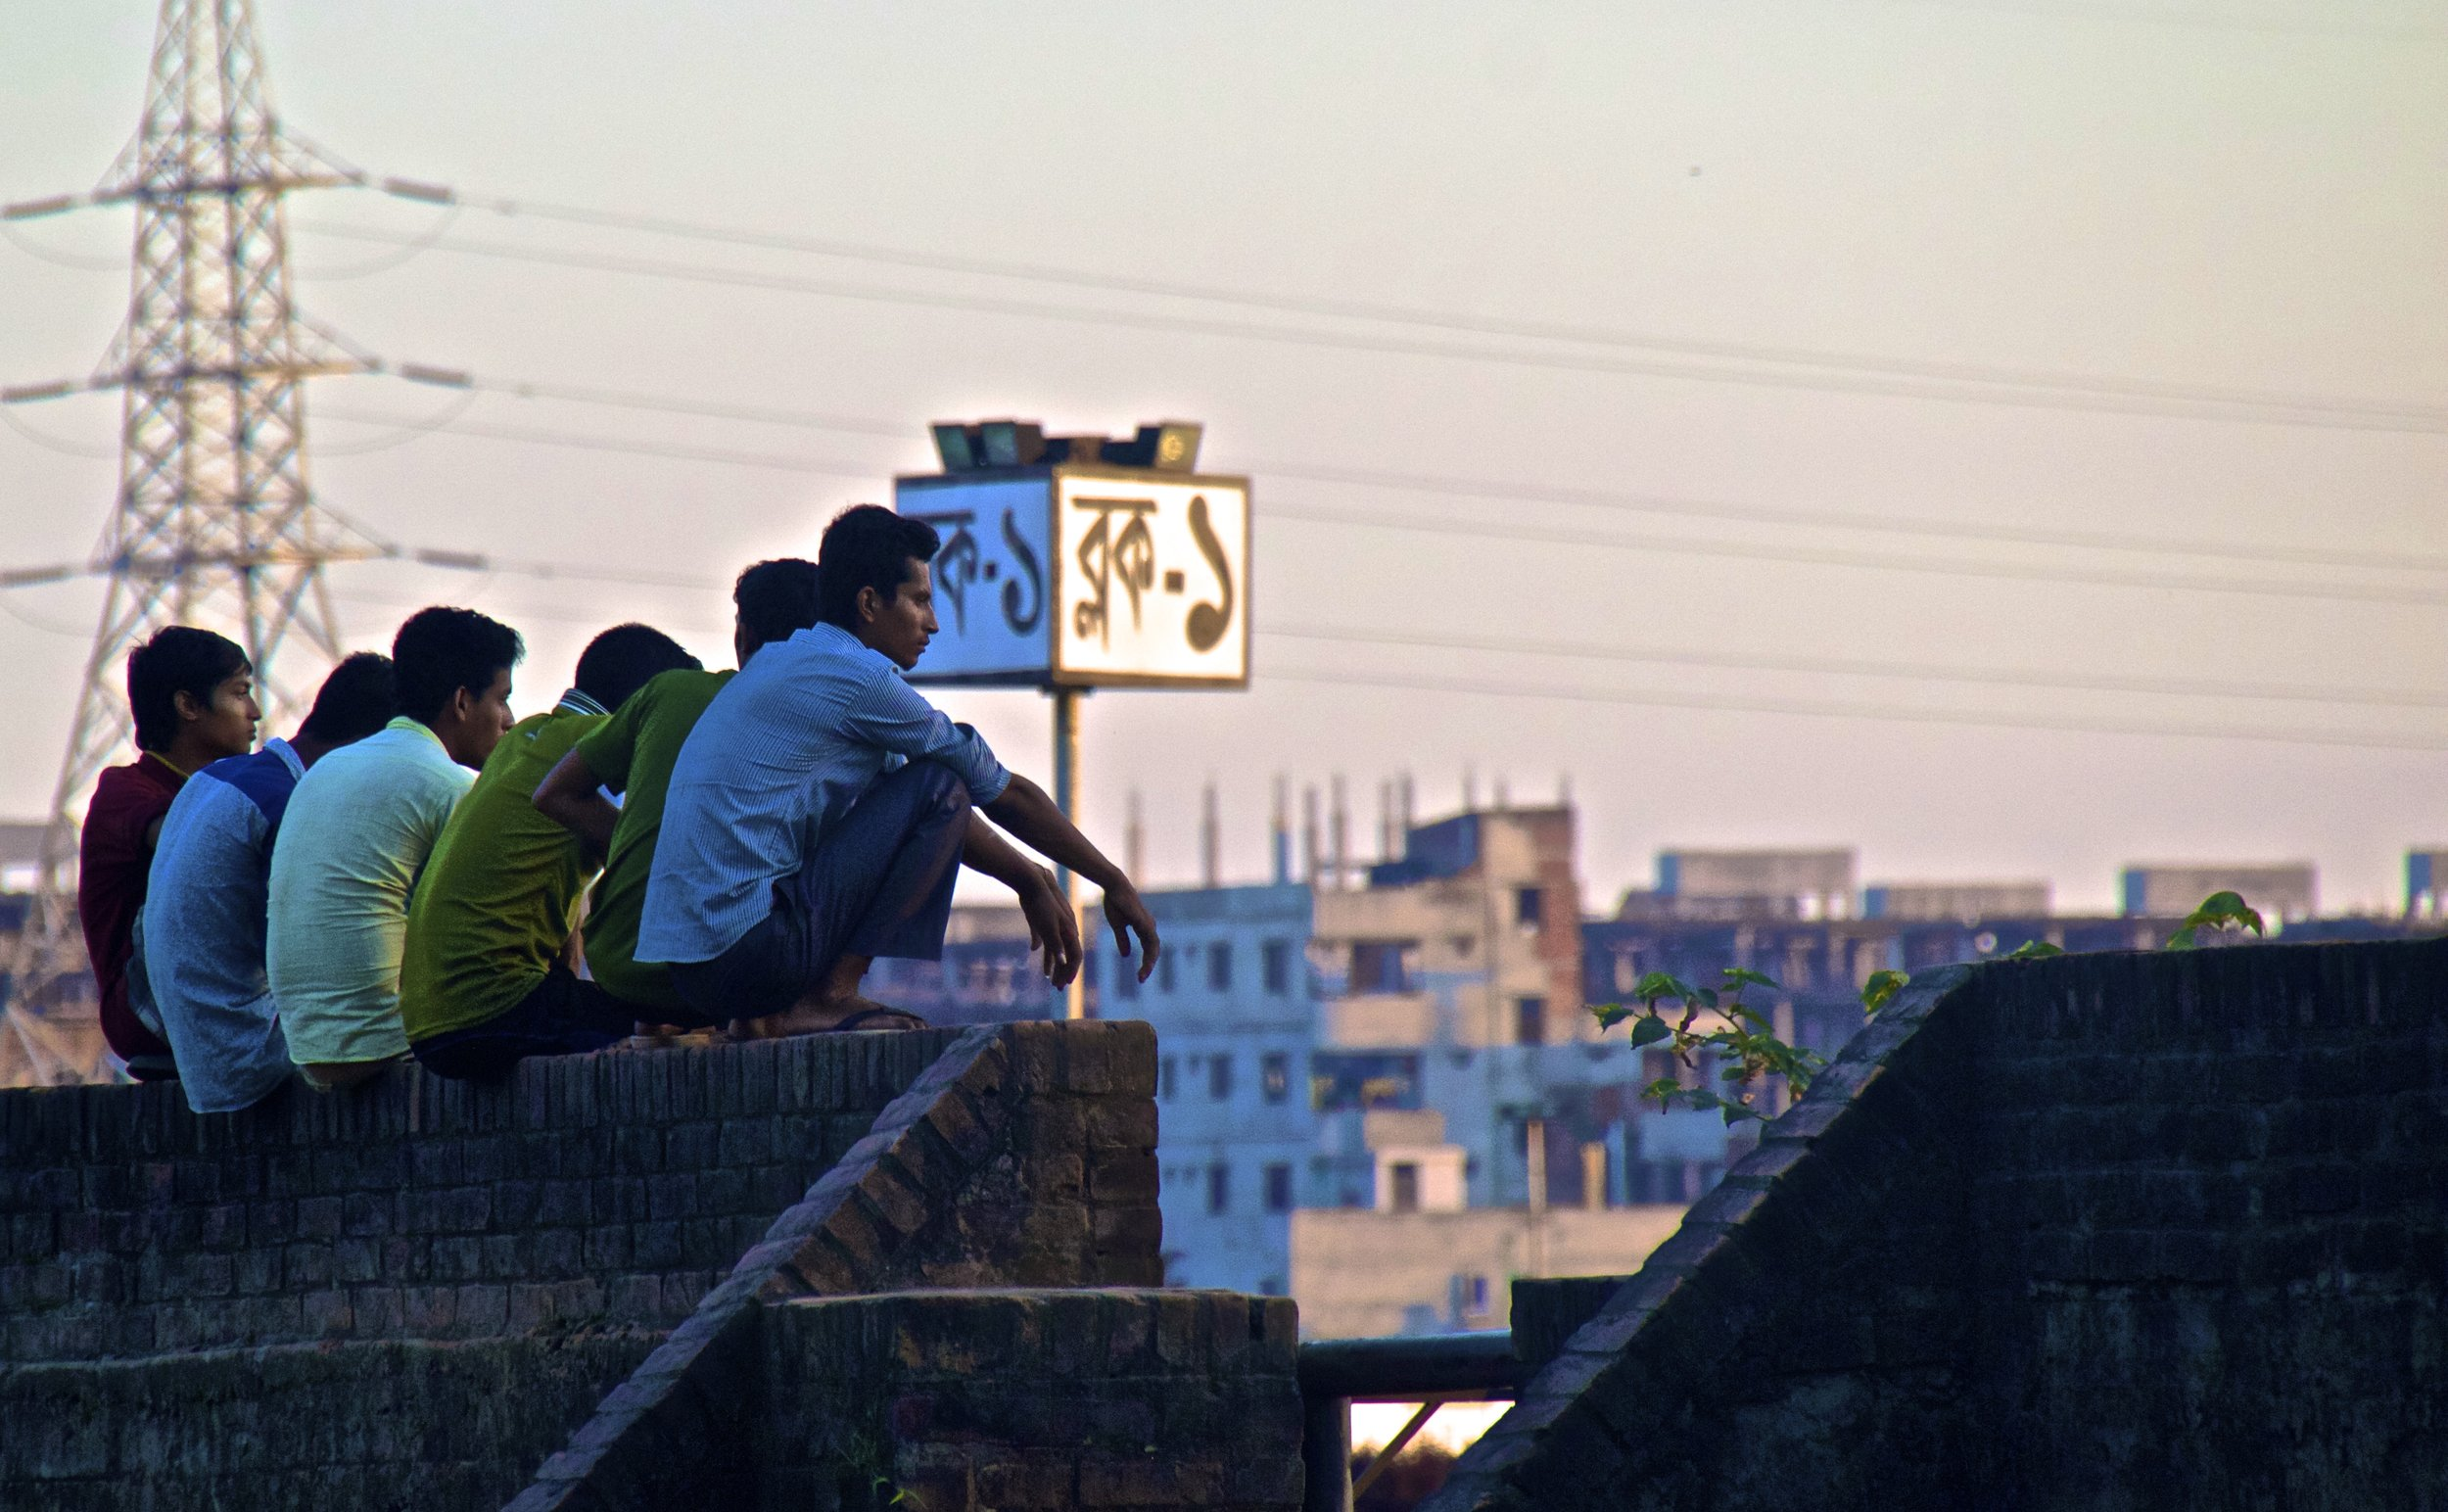 rayer bazar dhaka slums sunset 2.jpg